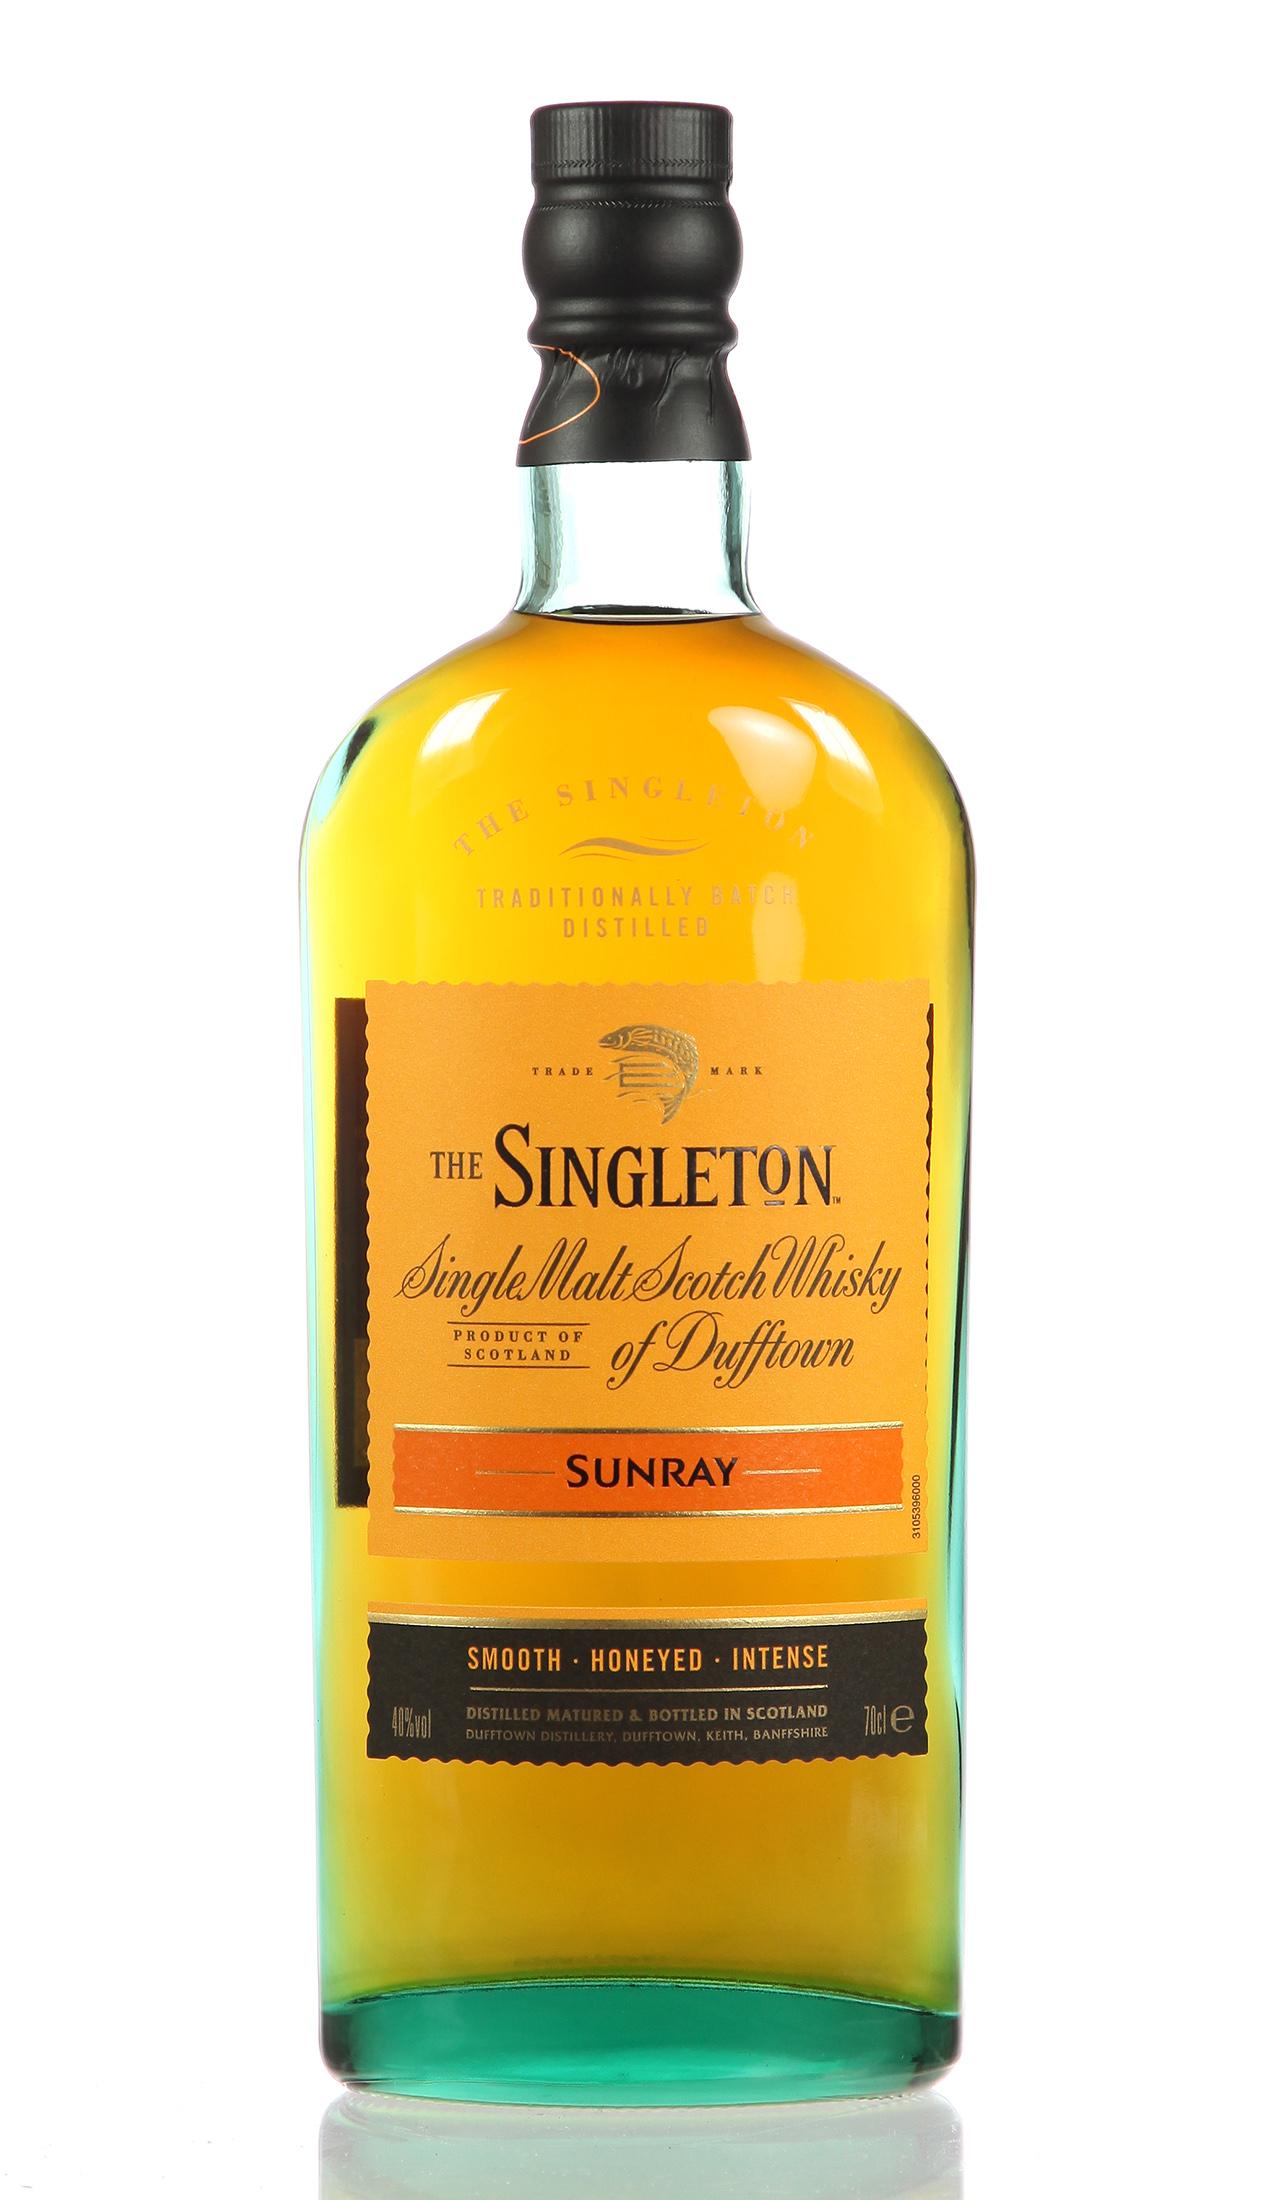 The Singleton of Dufftown Sunray